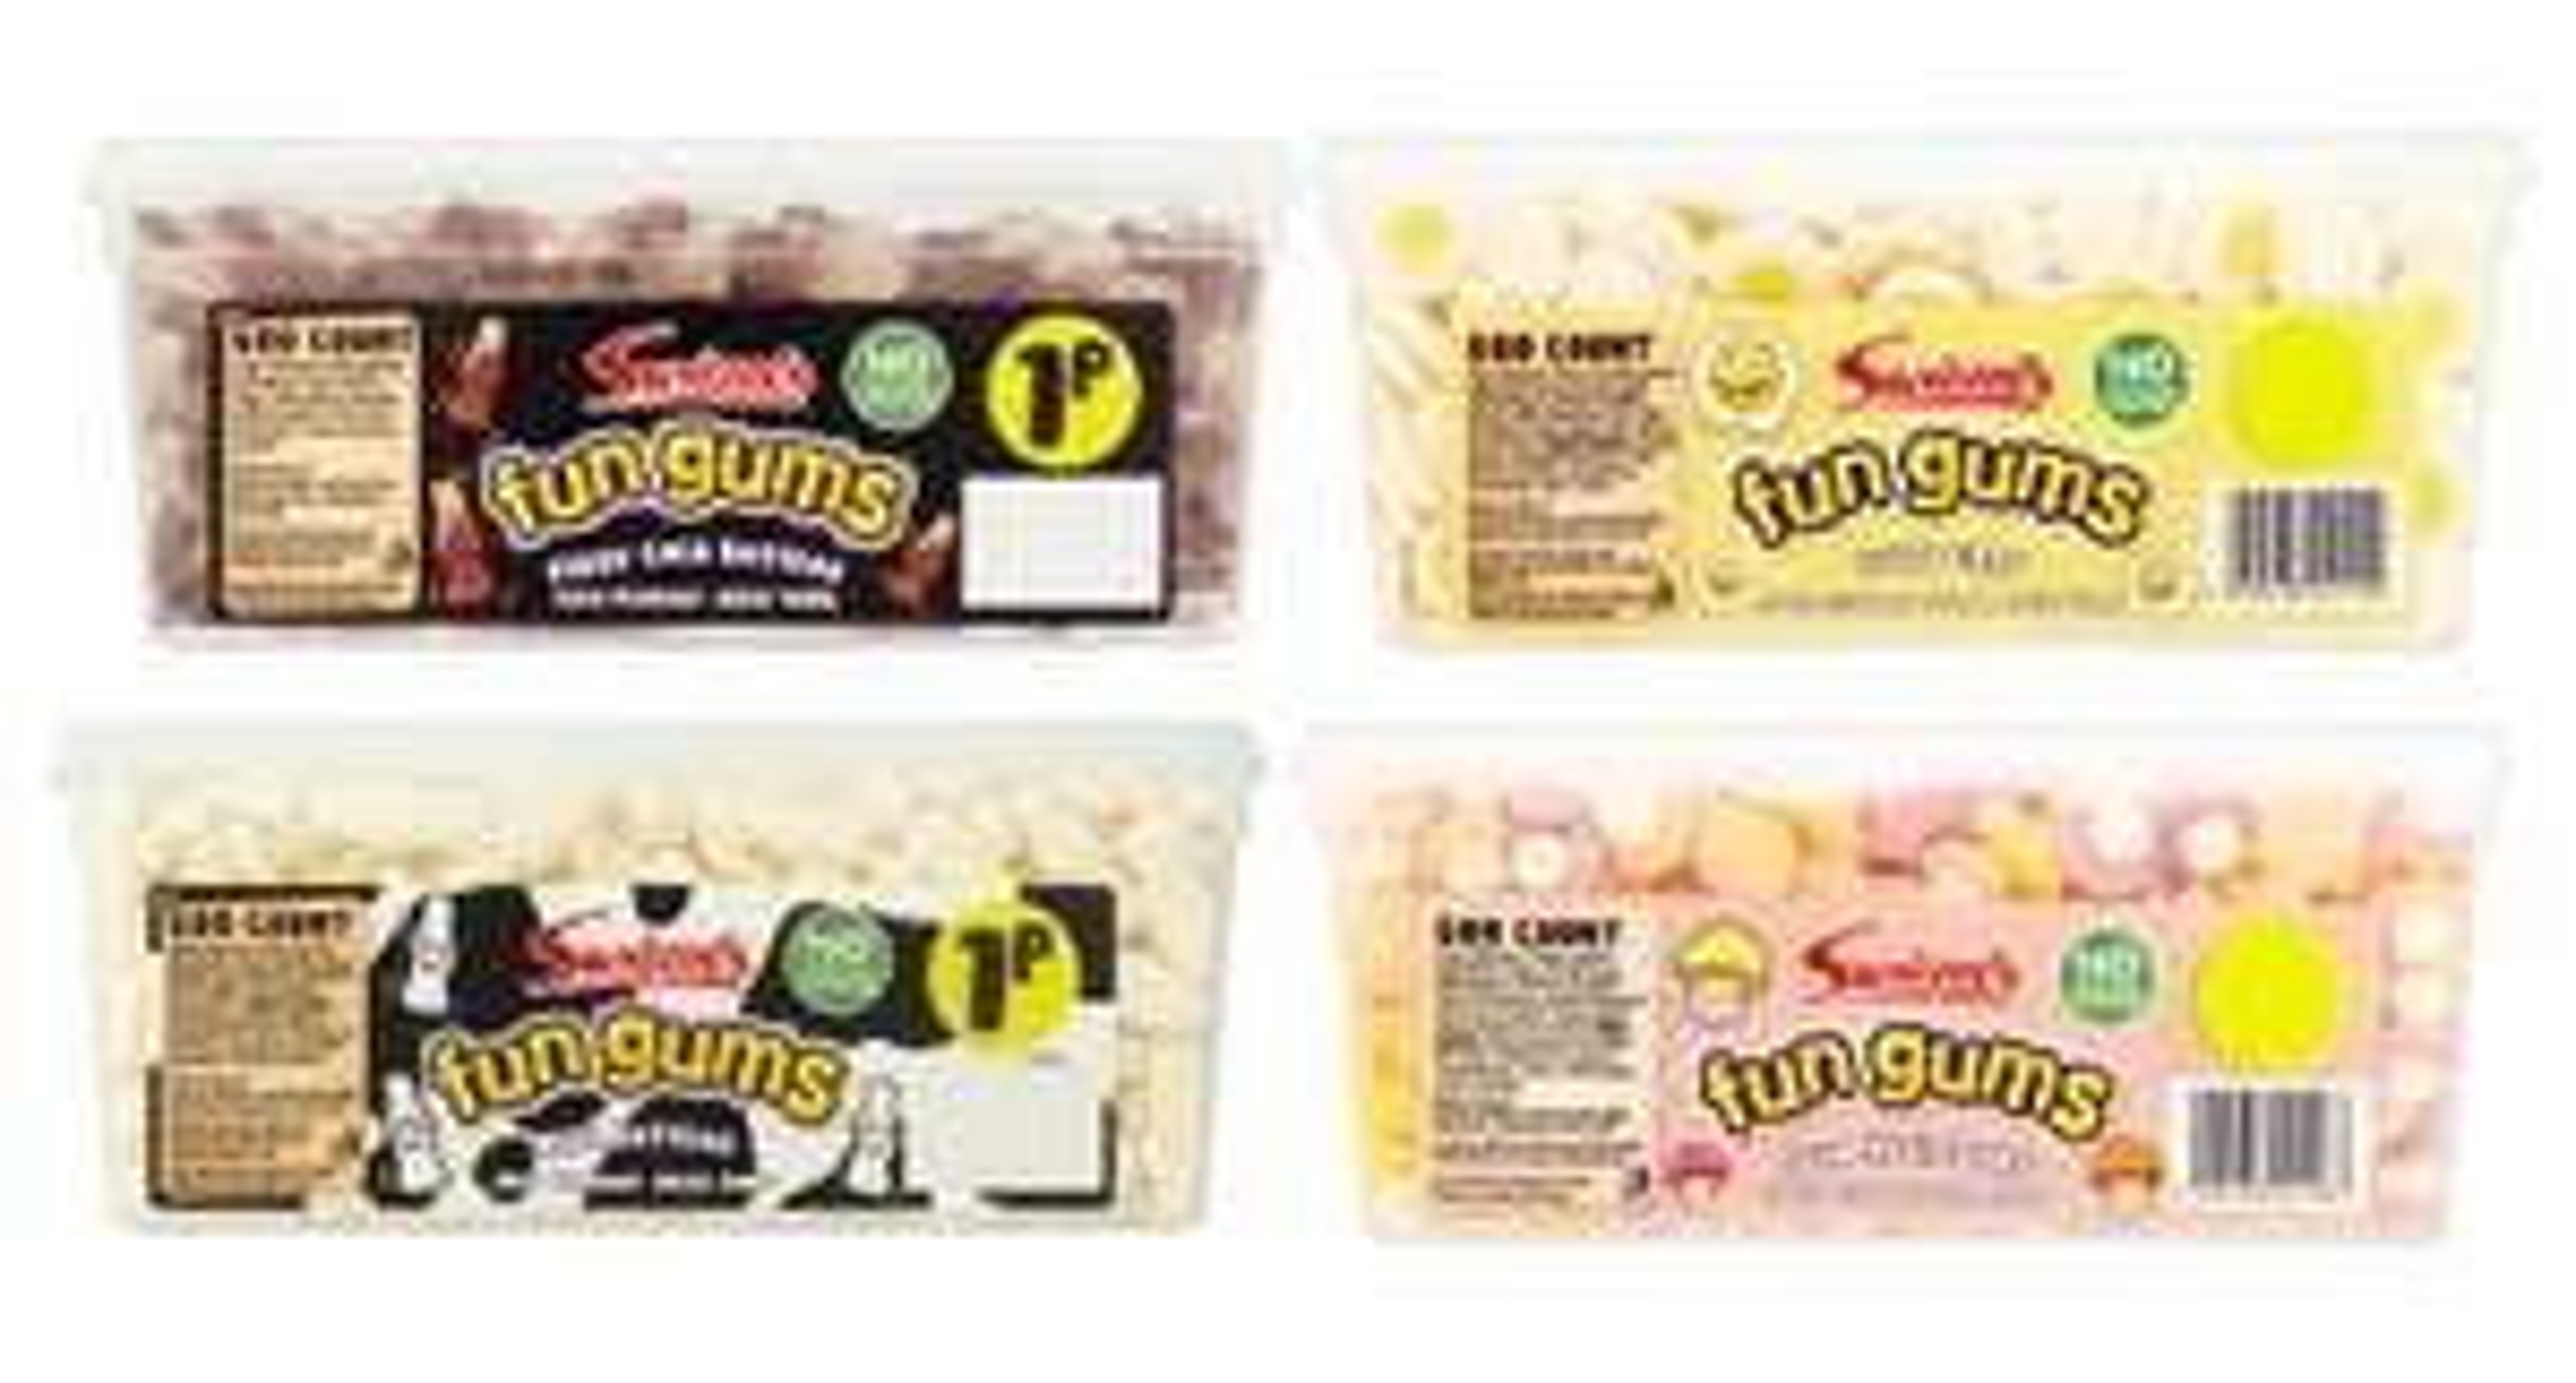 Swizzles Fun Gums Milk Bottles, Foam Mushrooms, Fizzy Cola Bottles, Fried Eggs (600 count) - £4.00 instore / online @ Iceland